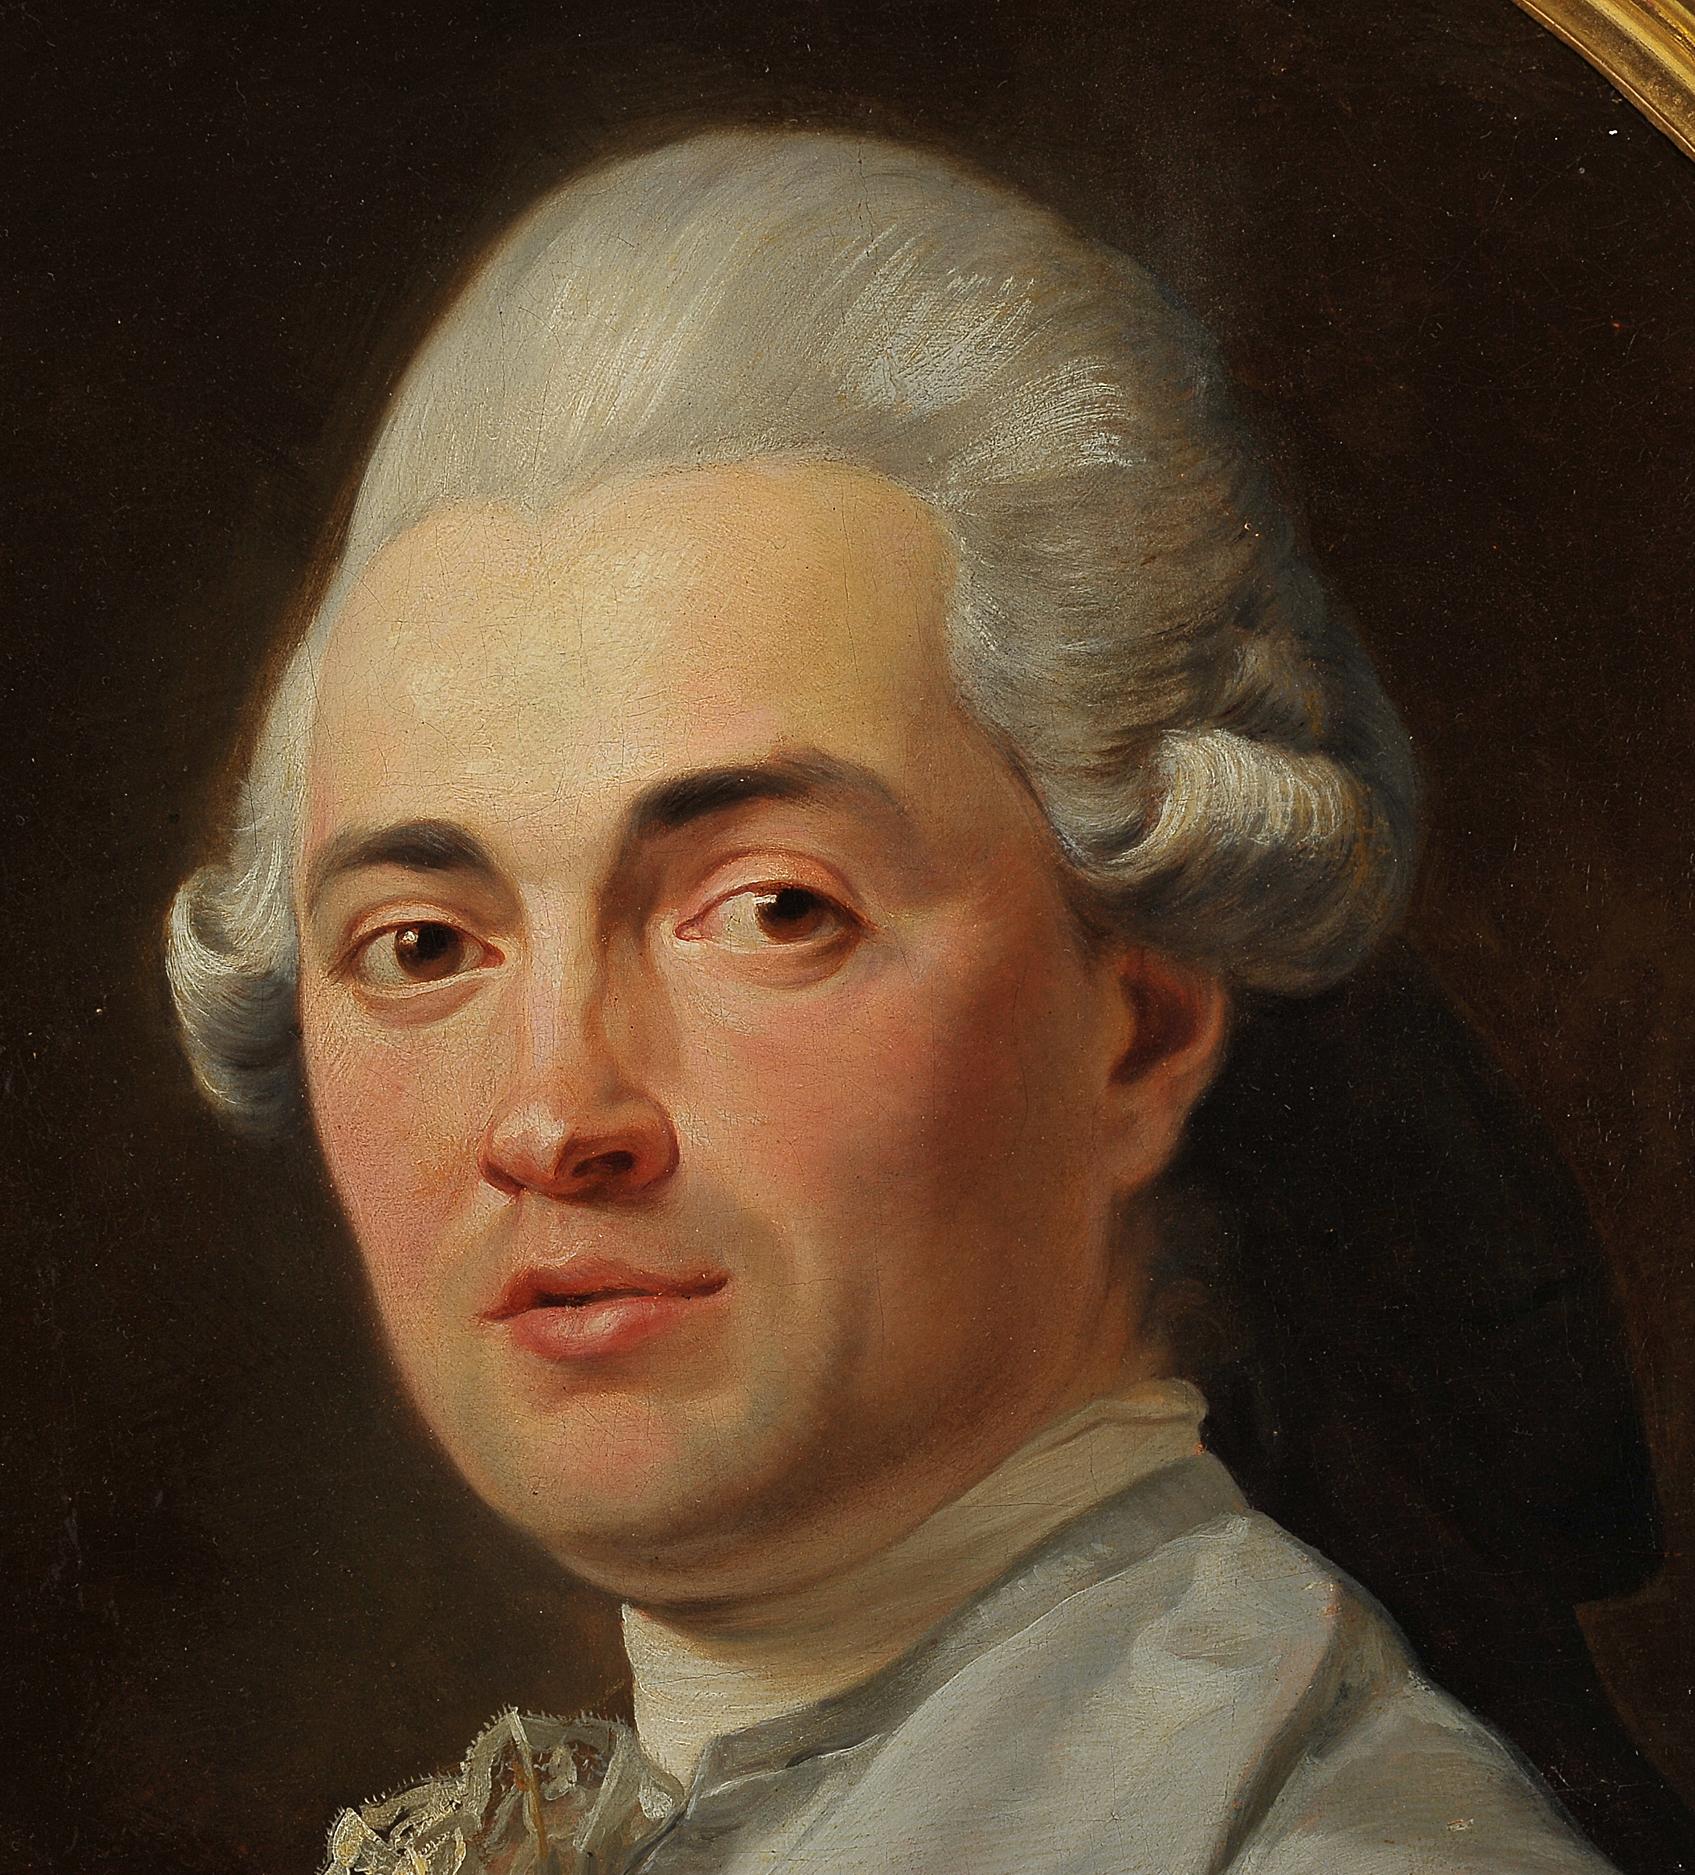 "Nicolas Guy Brenet, Paris 1728 – 1792 Paris, Portraits des Ehepaares ""Von Schauenstein"" - Image 5 of 11"